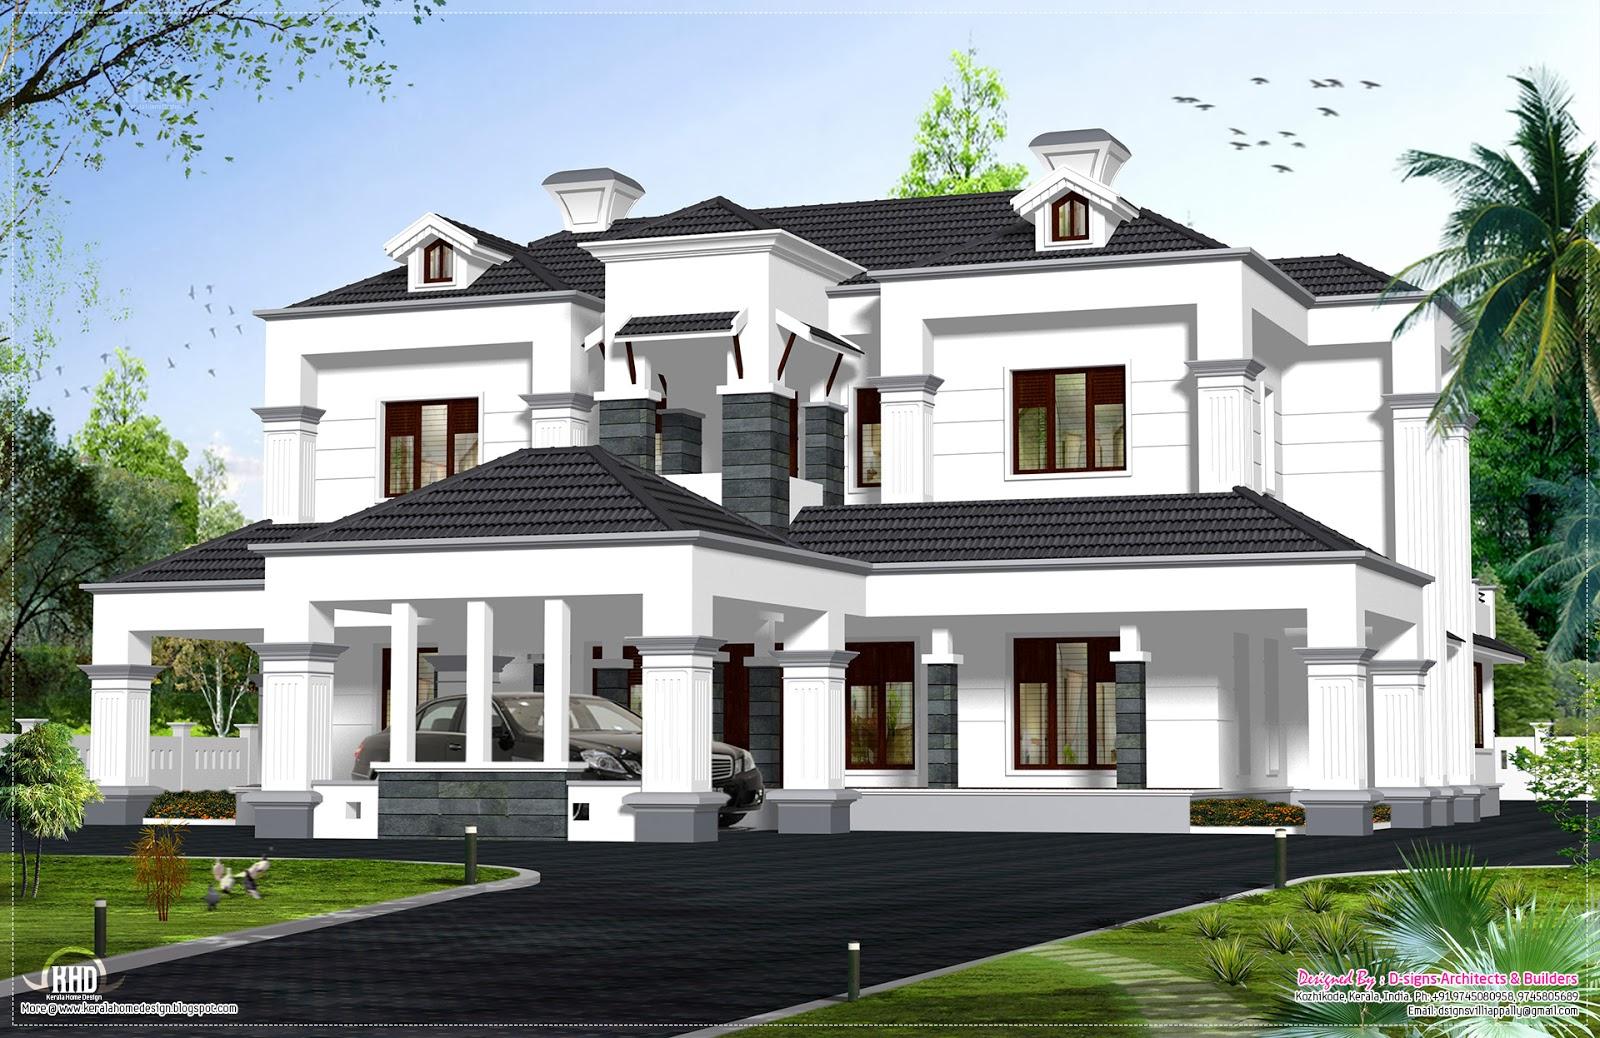 New Home Design March 2013